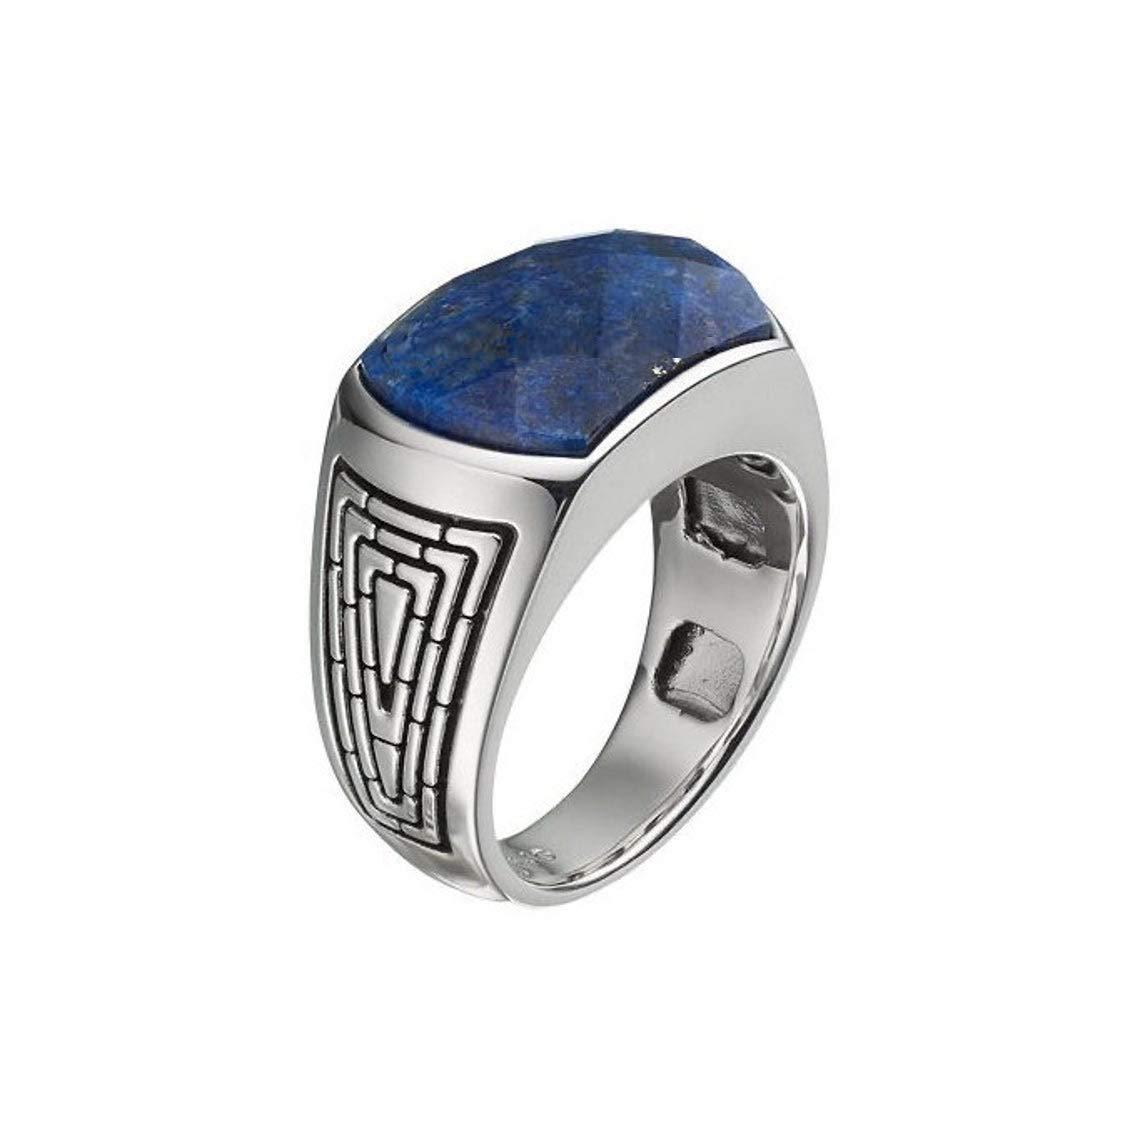 MENS LAPIS LAZULI Ring Men White Gold Ring Mens Pinky Ring 925 Sterling Silver Lapis Ring Mens Signet Ring Gift For Him Mens Ring